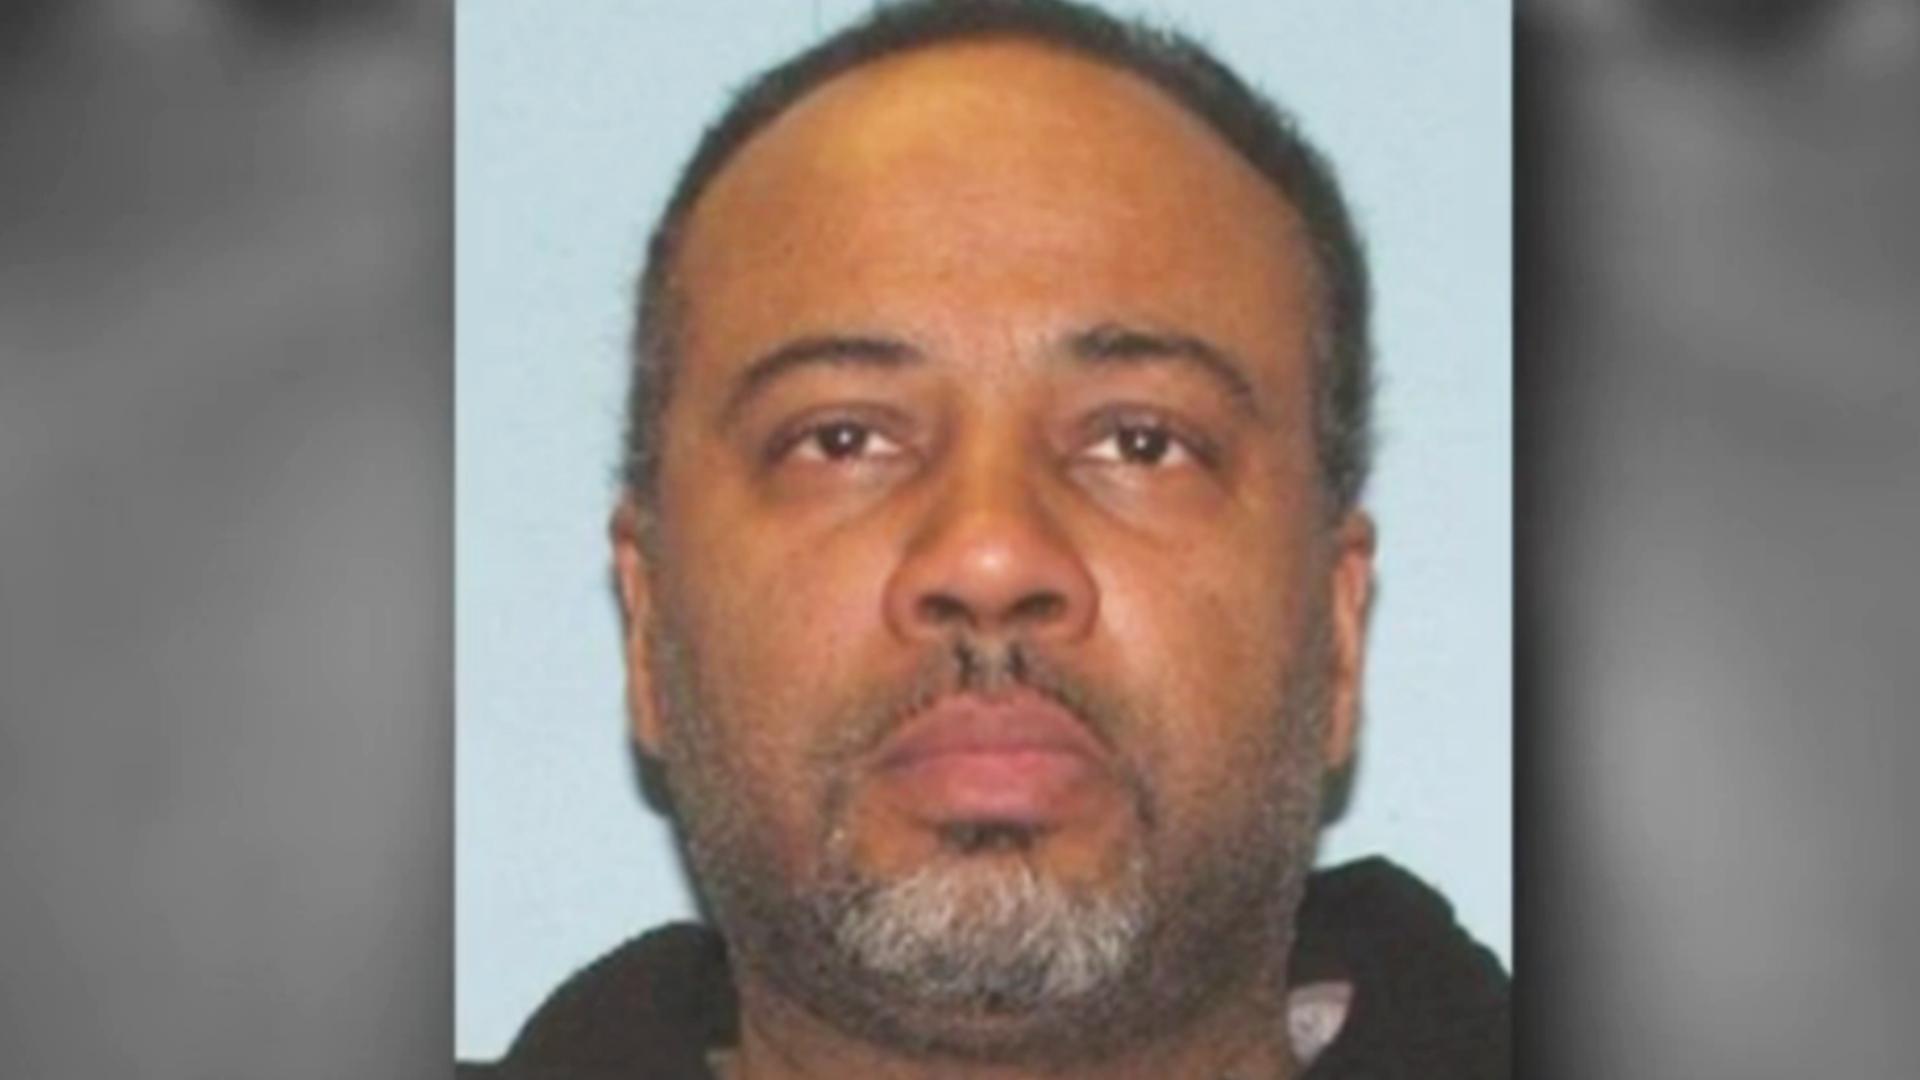 serial killer robert g rembert jr ohio truck driver accused of four murders nbc news